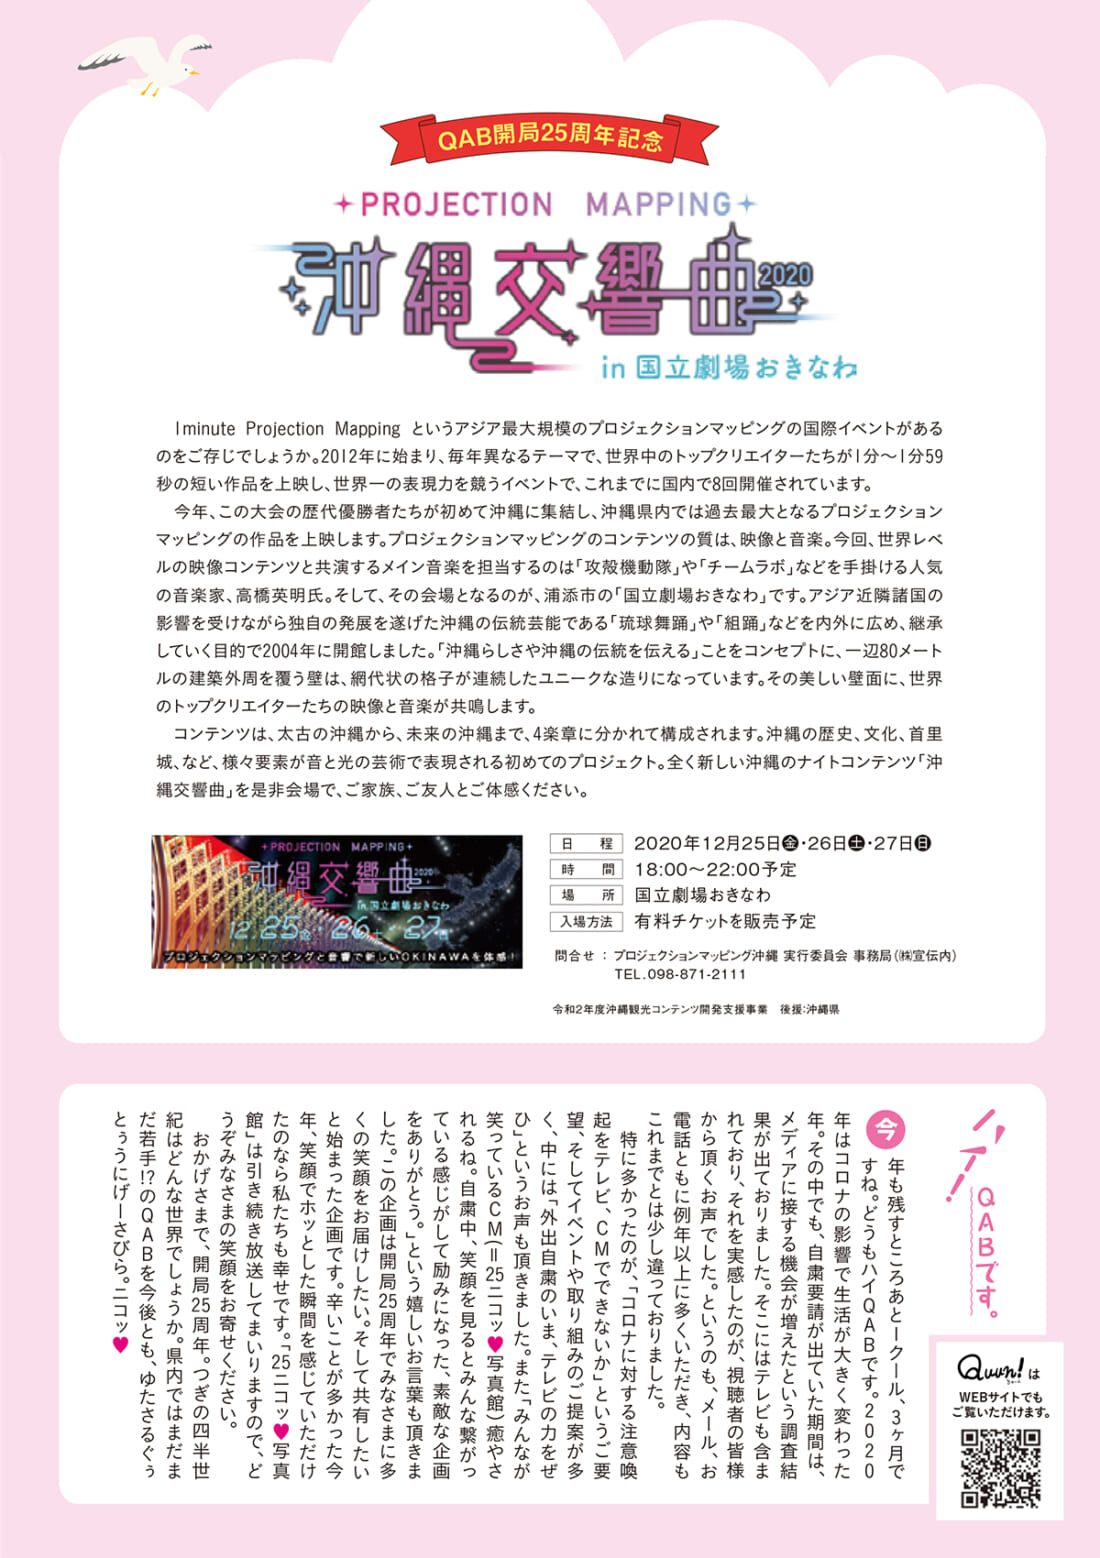 https://www.qab.co.jp/qgoro/wp-content/uploads/quun_1416-1100x1558.jpg